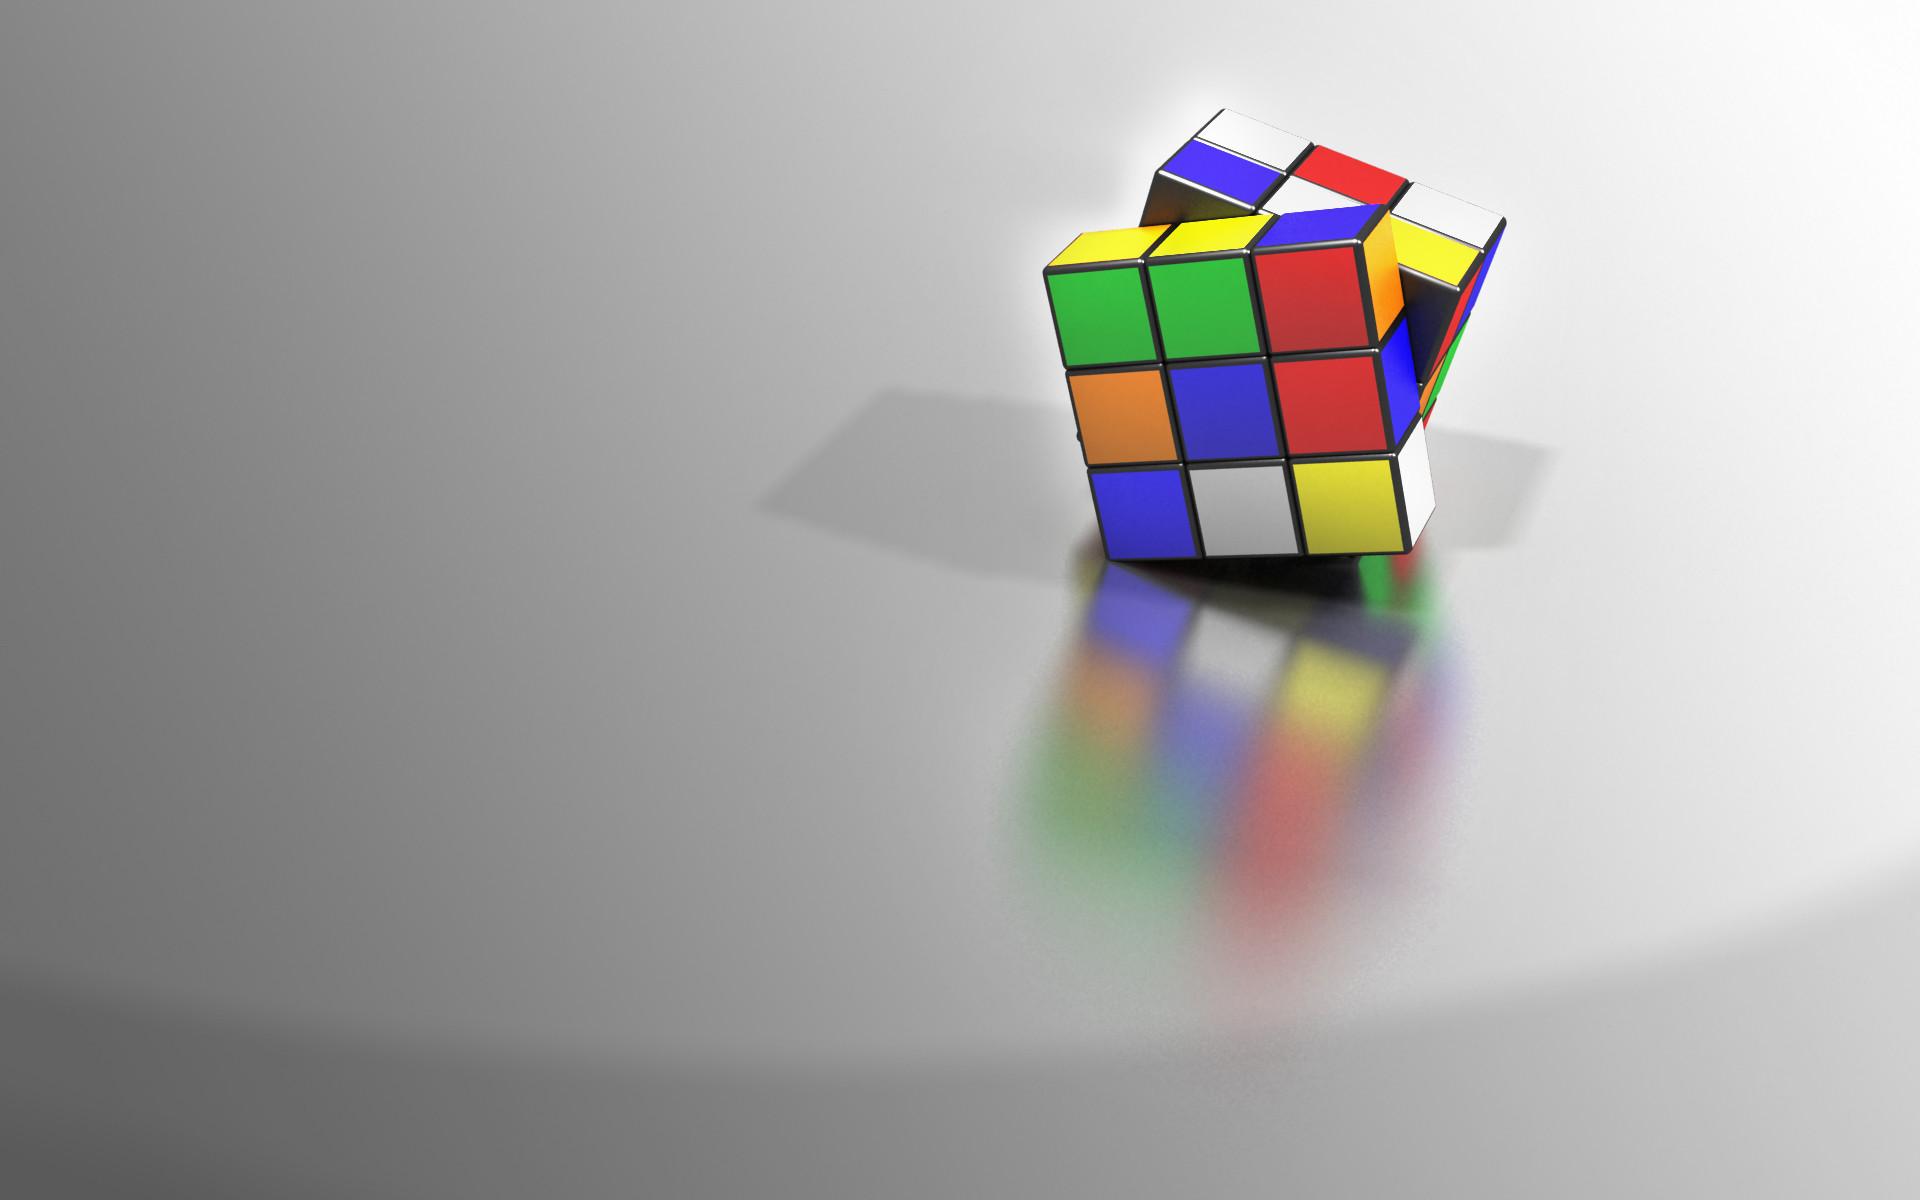 Rubiks Cube Wallpaper 5852